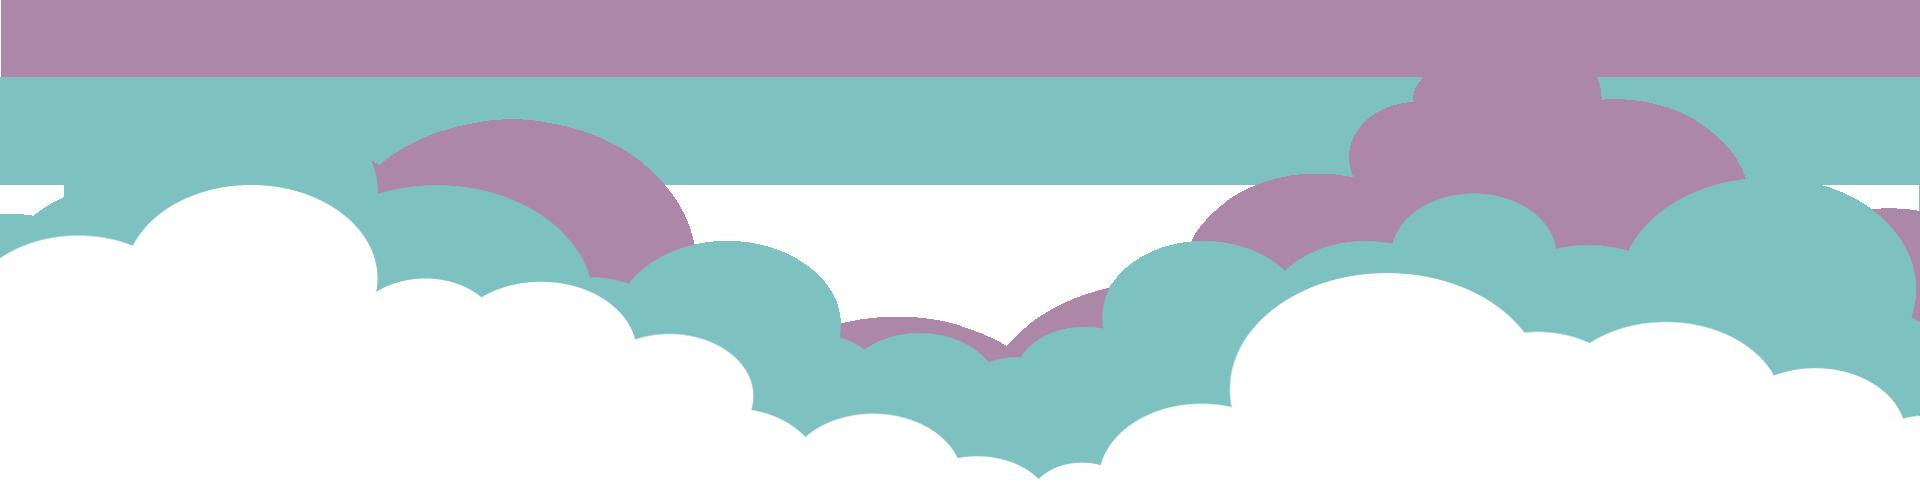 footer-cloud